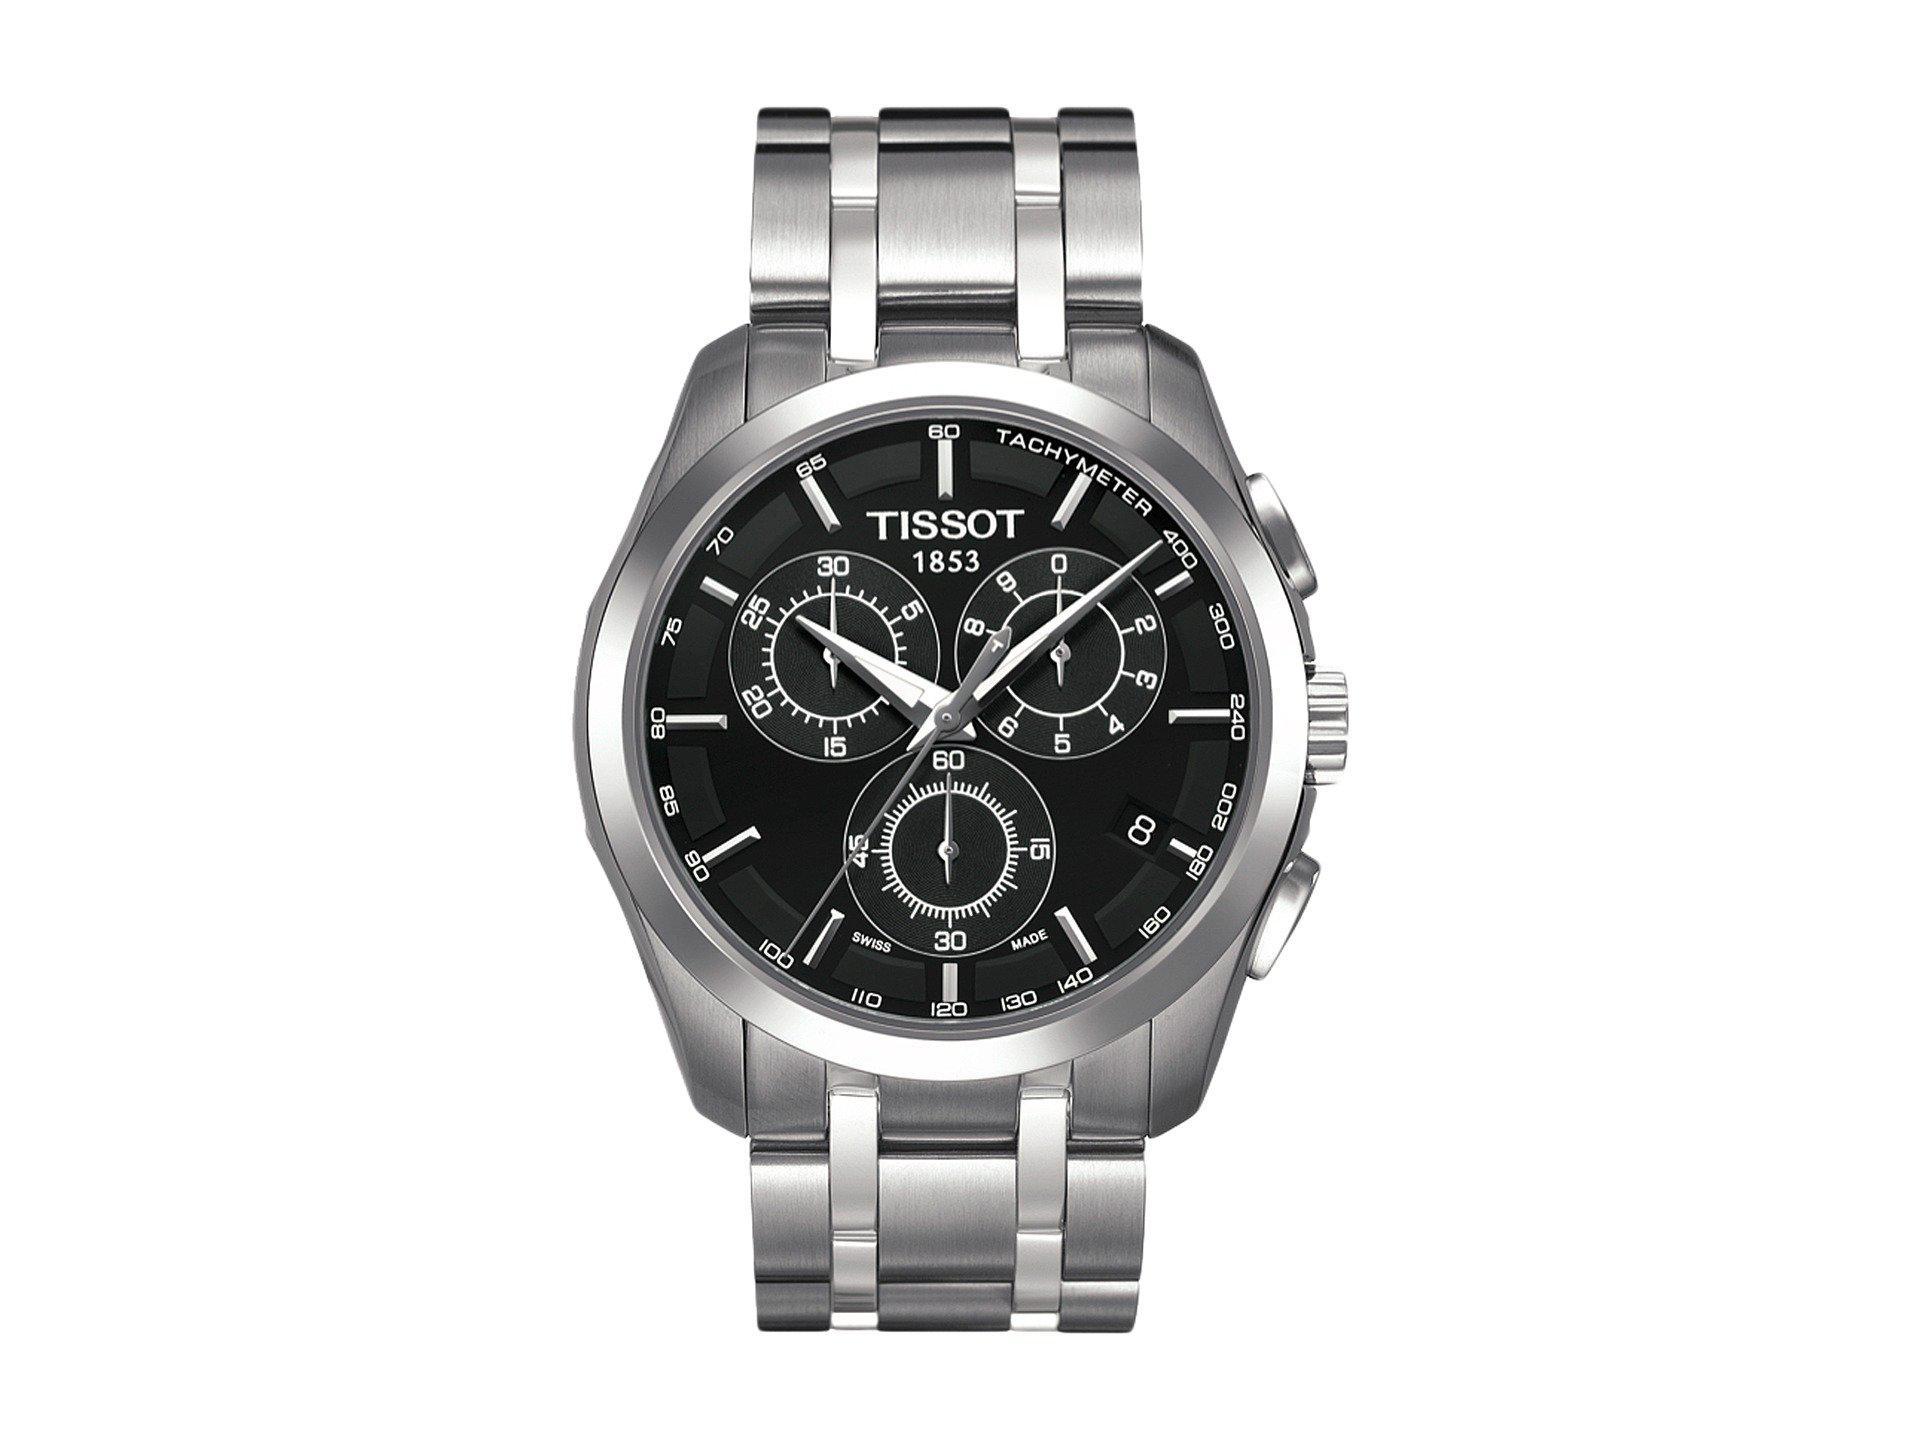 Lyst Tissot Couturier Chronograph T0356171105100 Black Grey T0356271605100 View Fullscreen